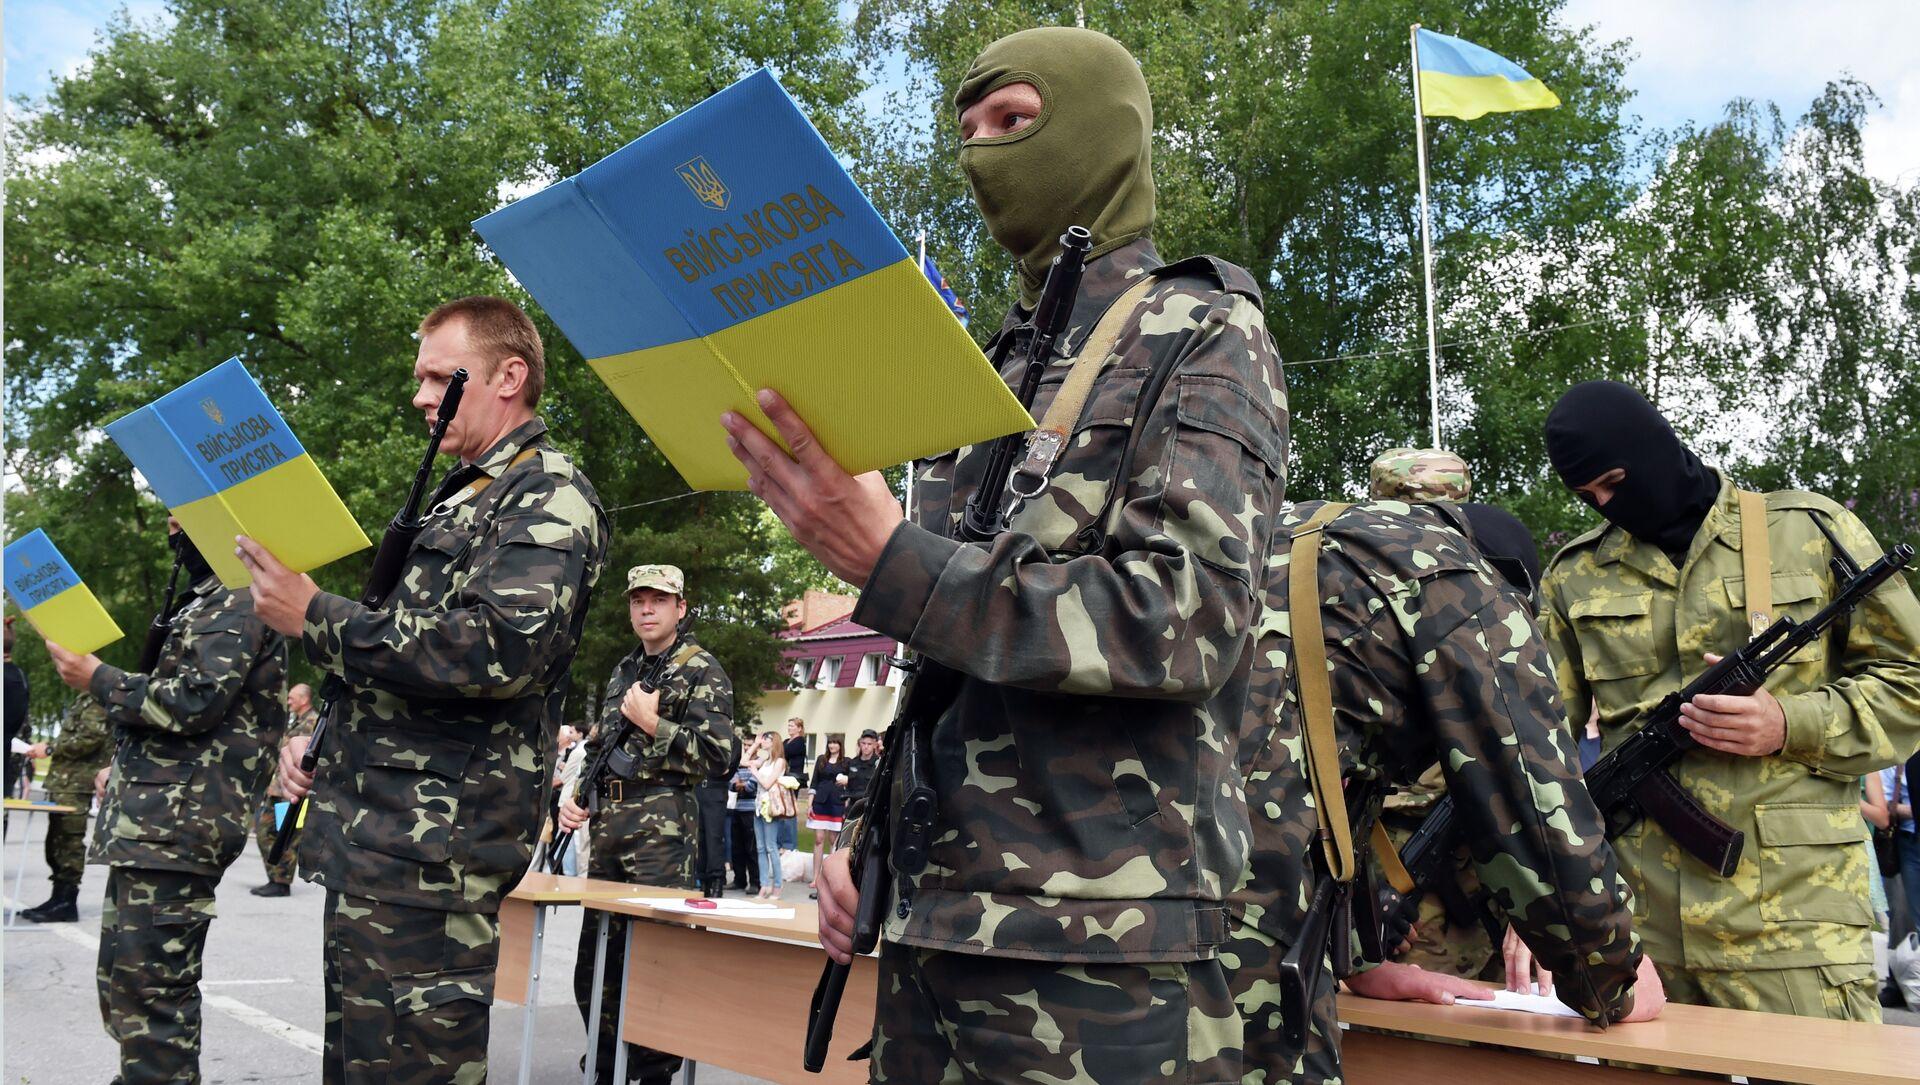 New volunteer recruits of the Ukrainian Army - Sputnik International, 1920, 06.08.2021